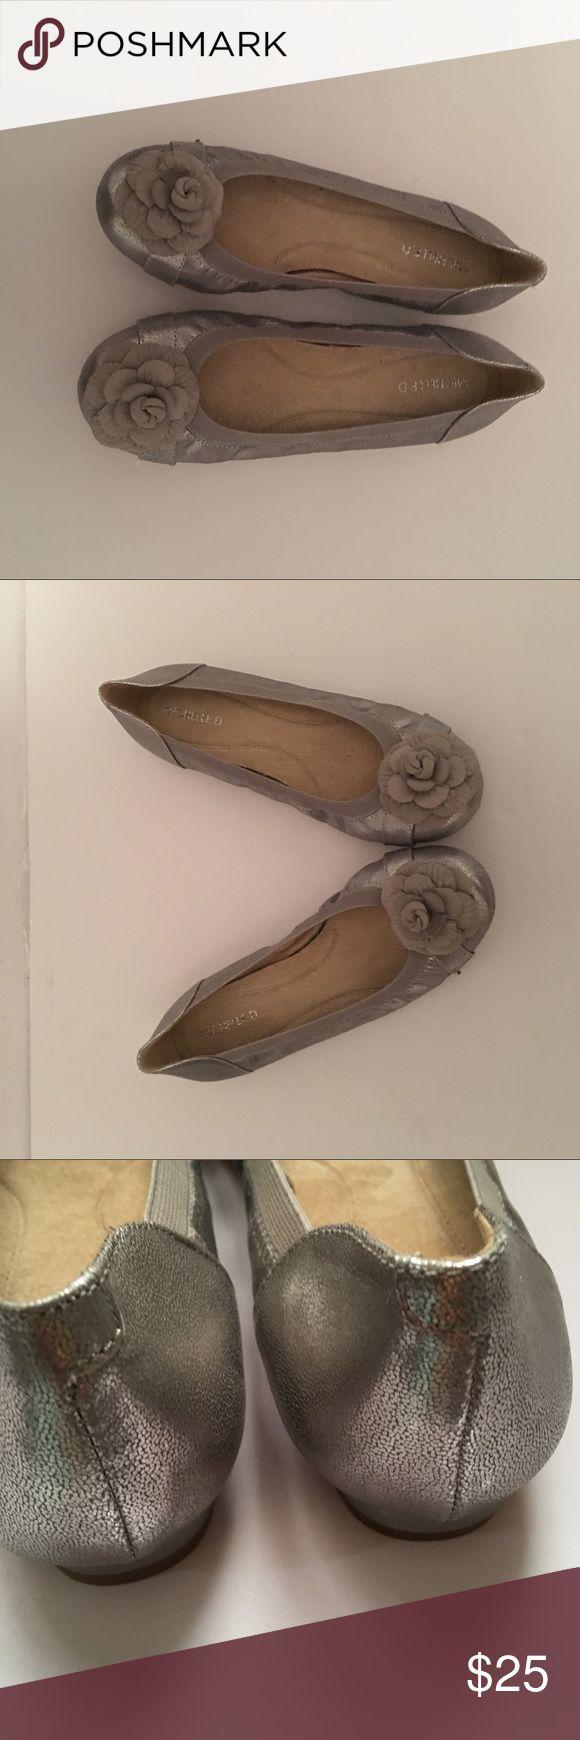 Michelle D ballet shoes Michelle D Silver ballet flats with large flower accent . Great condition 9 1/2 🌻🌻🌻make me a deal !!!!! Michelle D Shoes Flats & Loafers